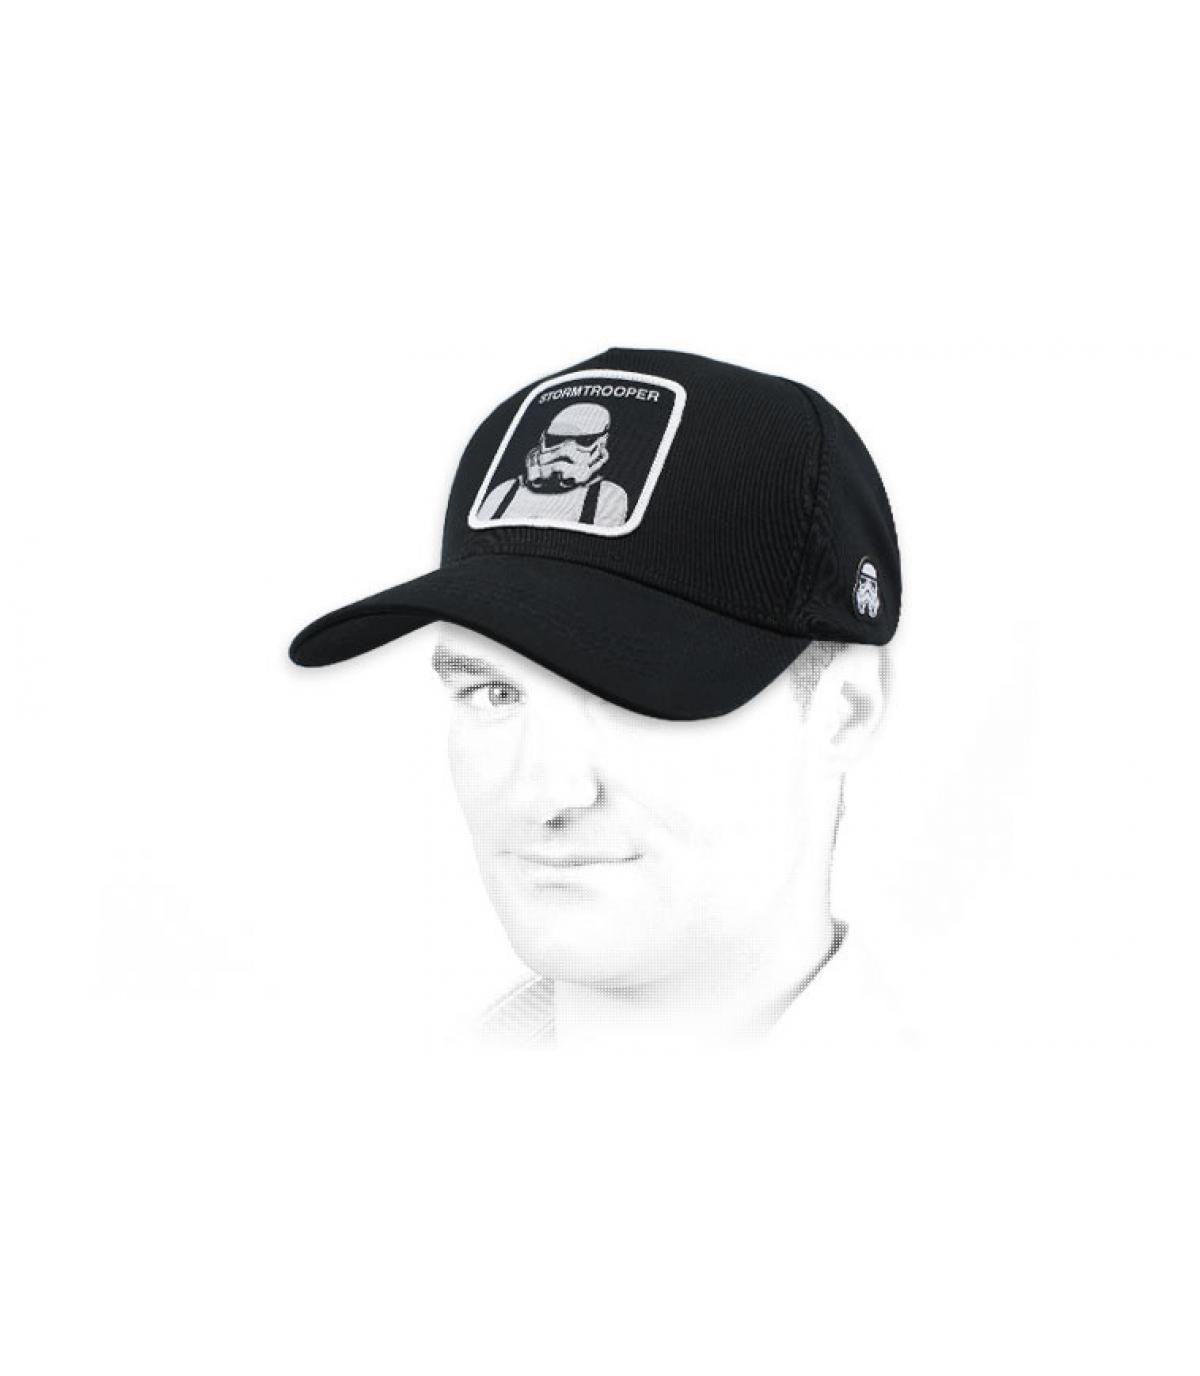 Cappellino nero Stormtrooper